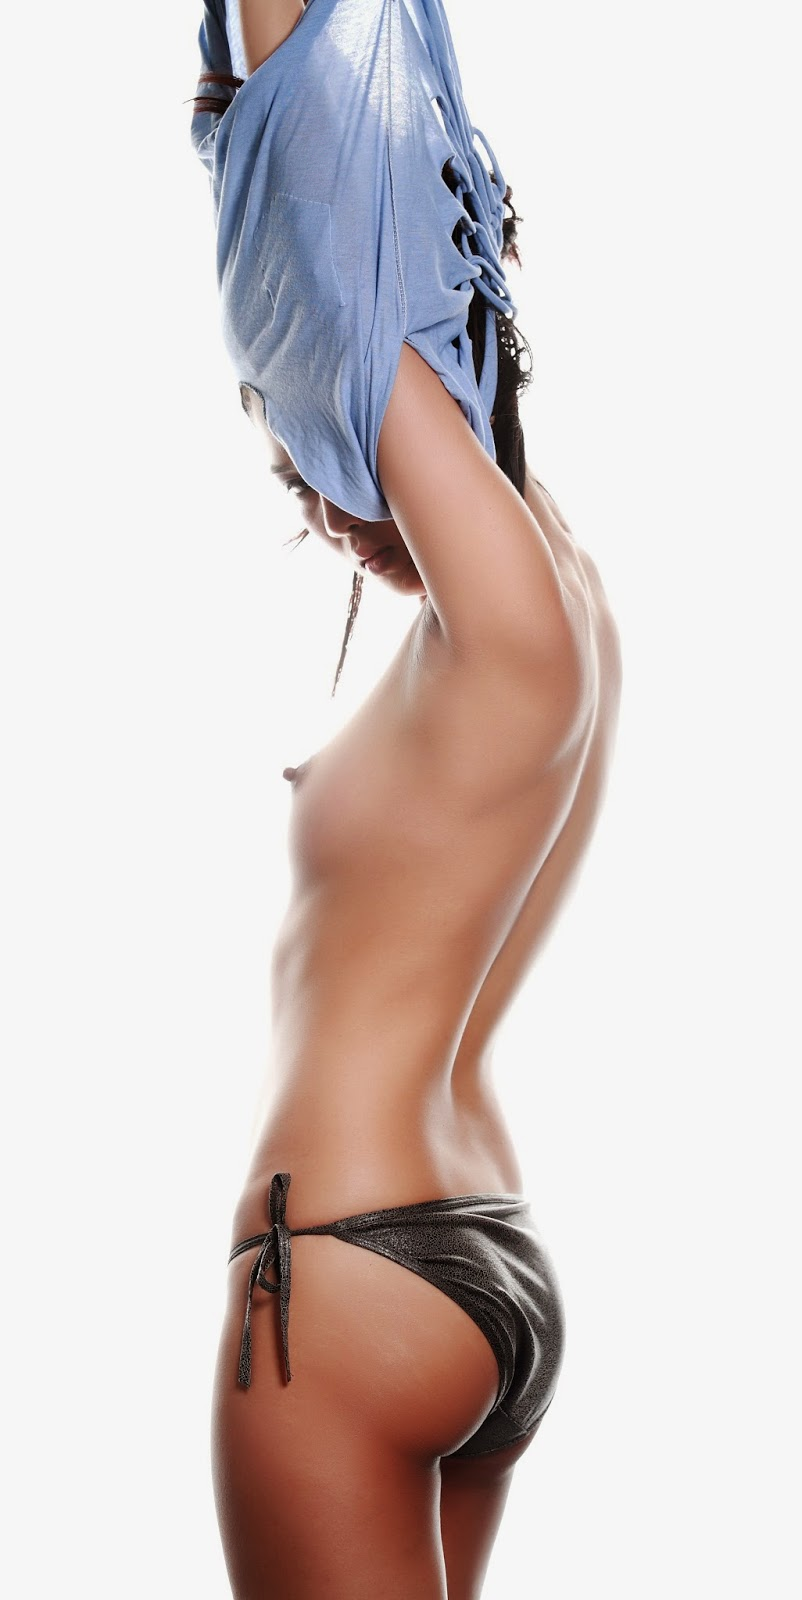 Bared Body